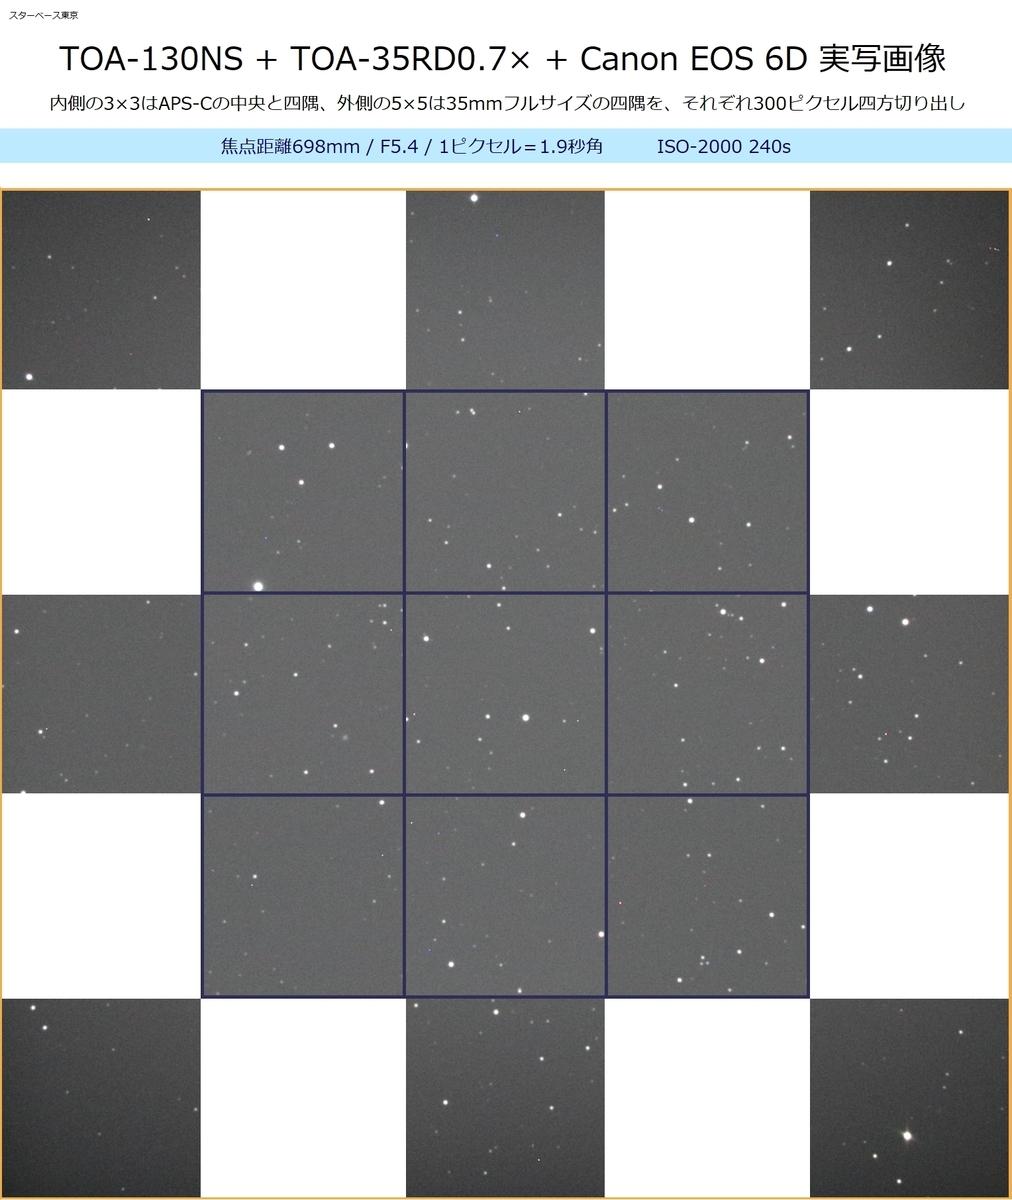 f:id:starbase:20210622214550j:plain